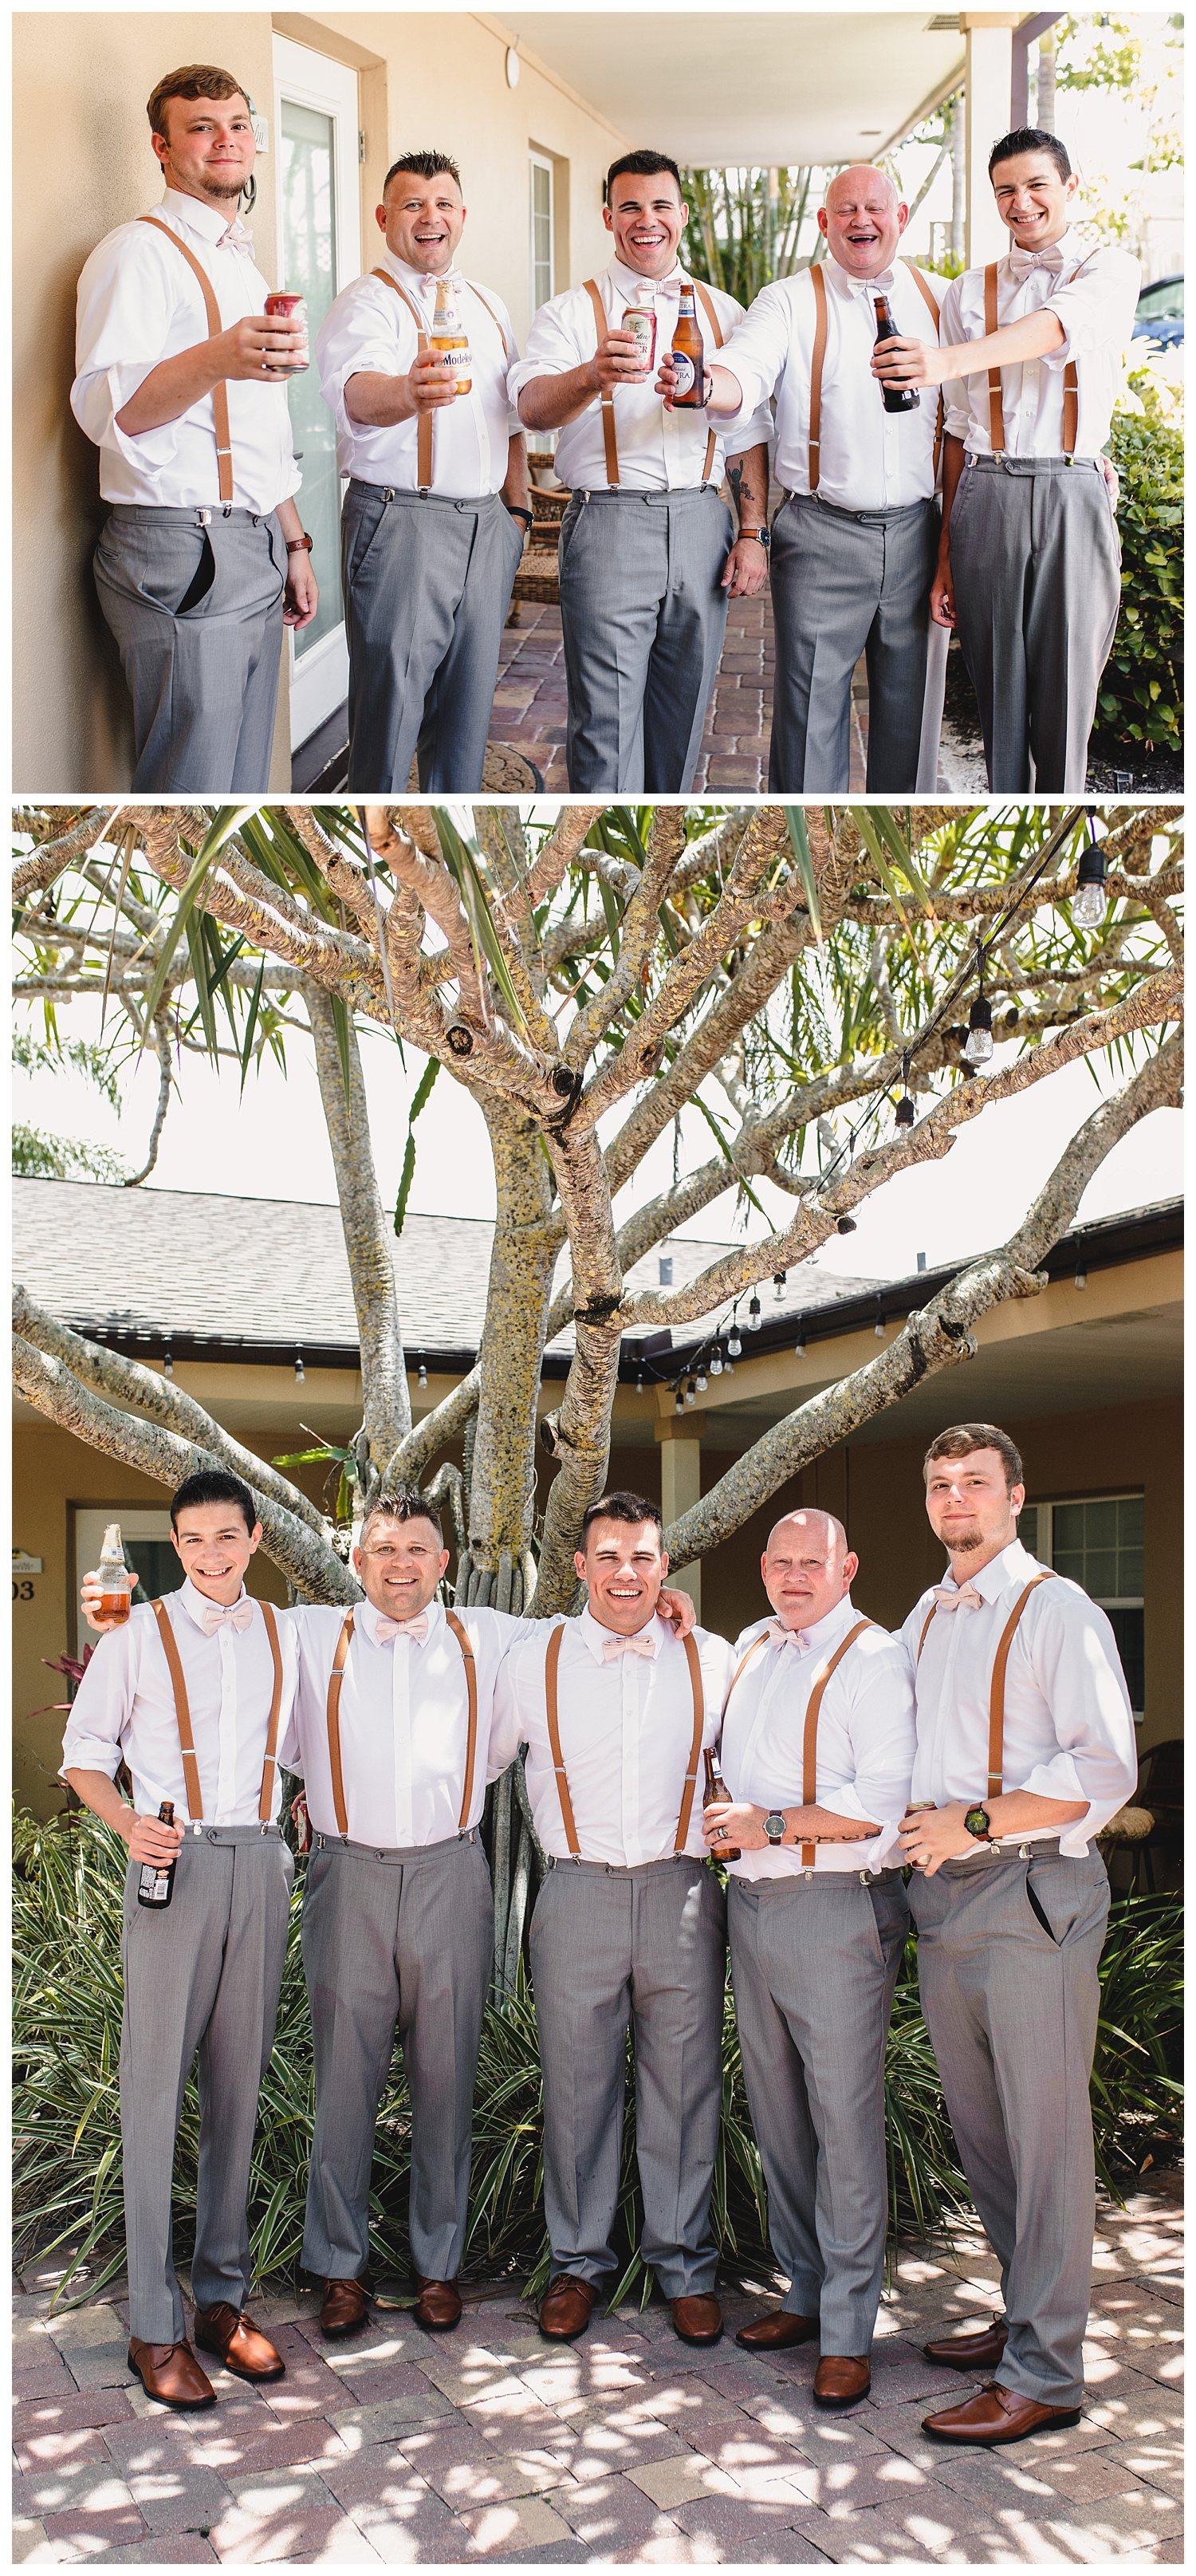 Kelsey_Diane_Photography_Destination_Wedding_Sarasota_Florida_Beach_Wedding_Alex_Austin_0614.jpg